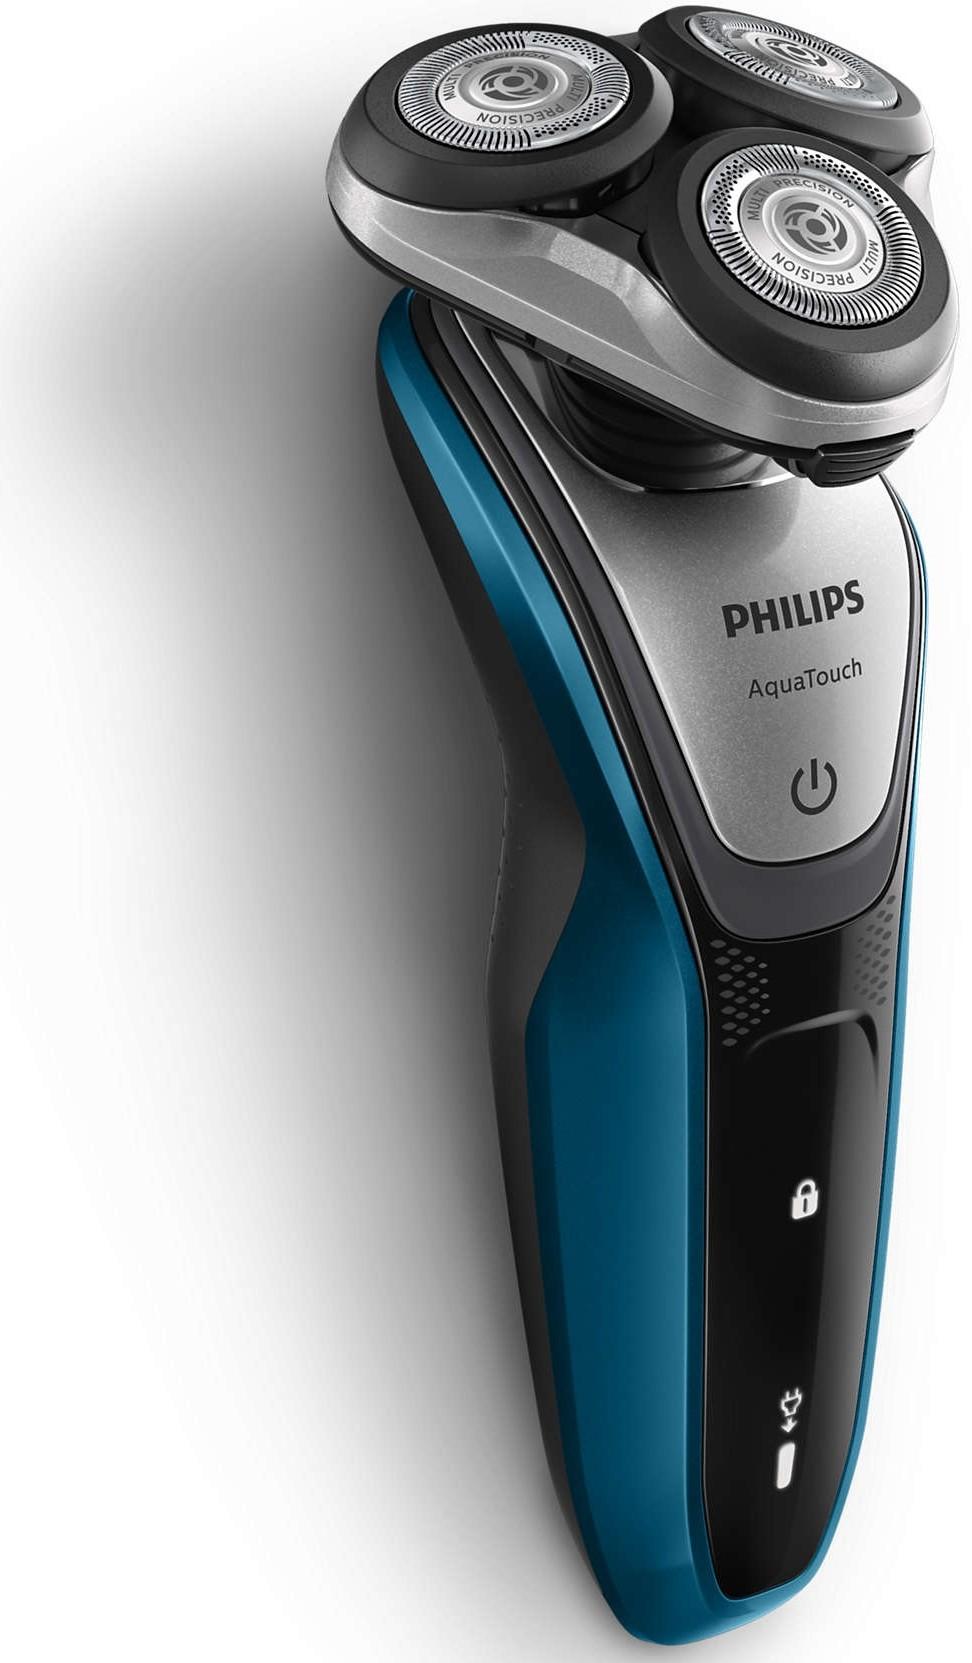 Philips AquaTouch Series 5000 5420/06